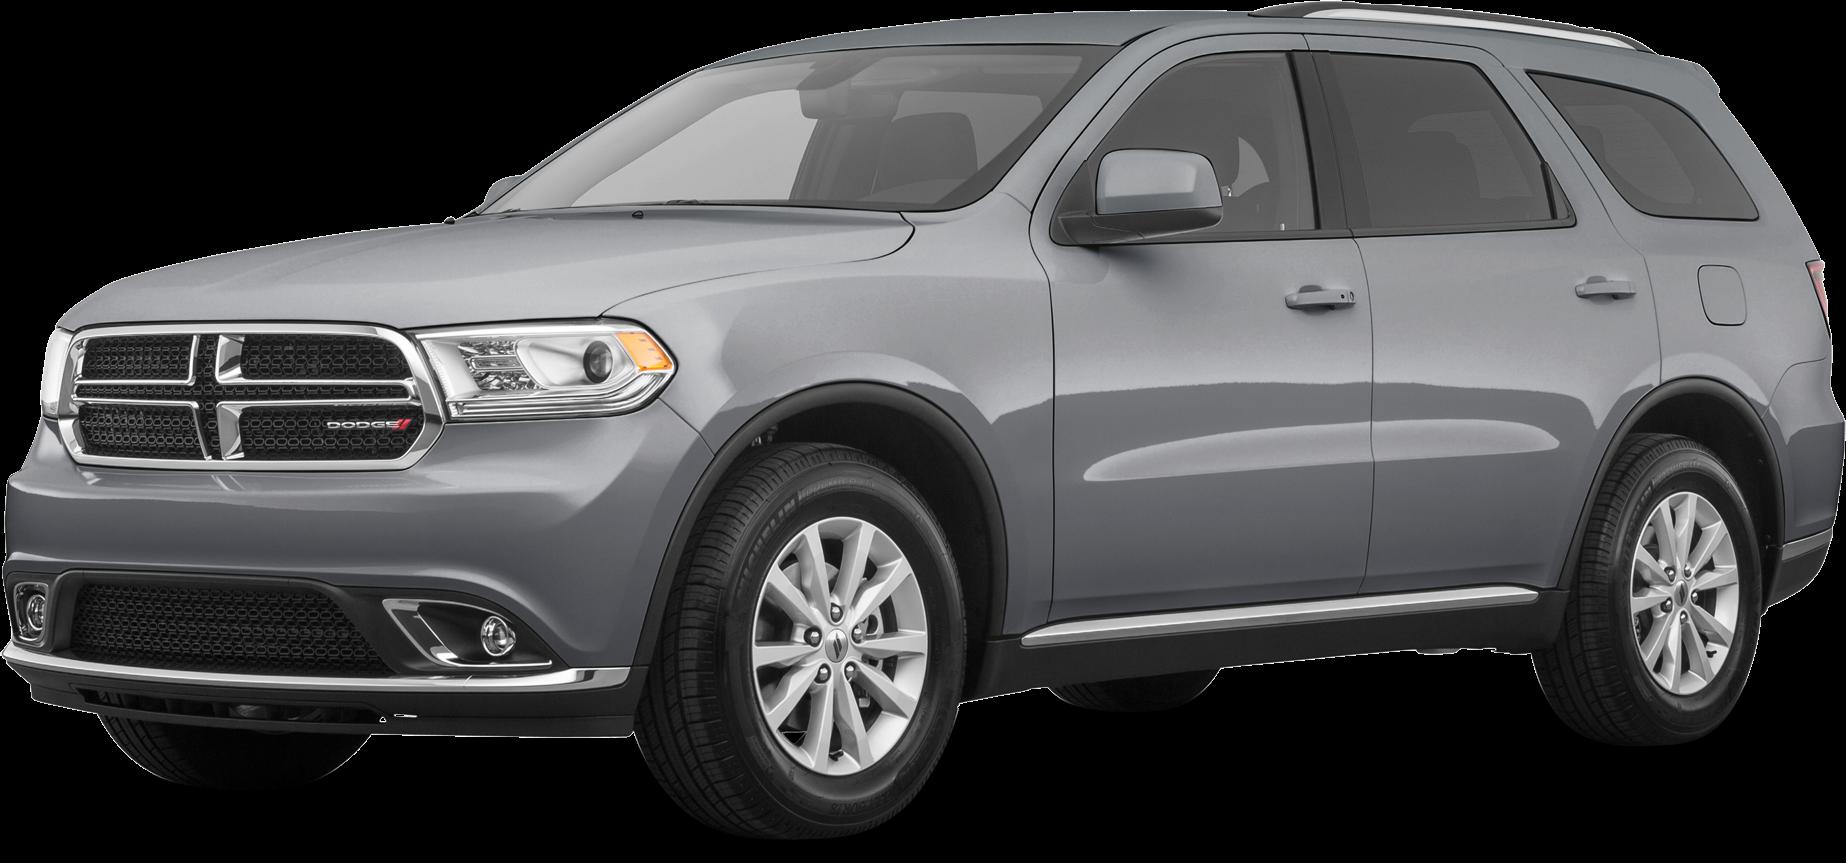 2019 Dodge Durango Values Cars For Sale Kelley Blue Book